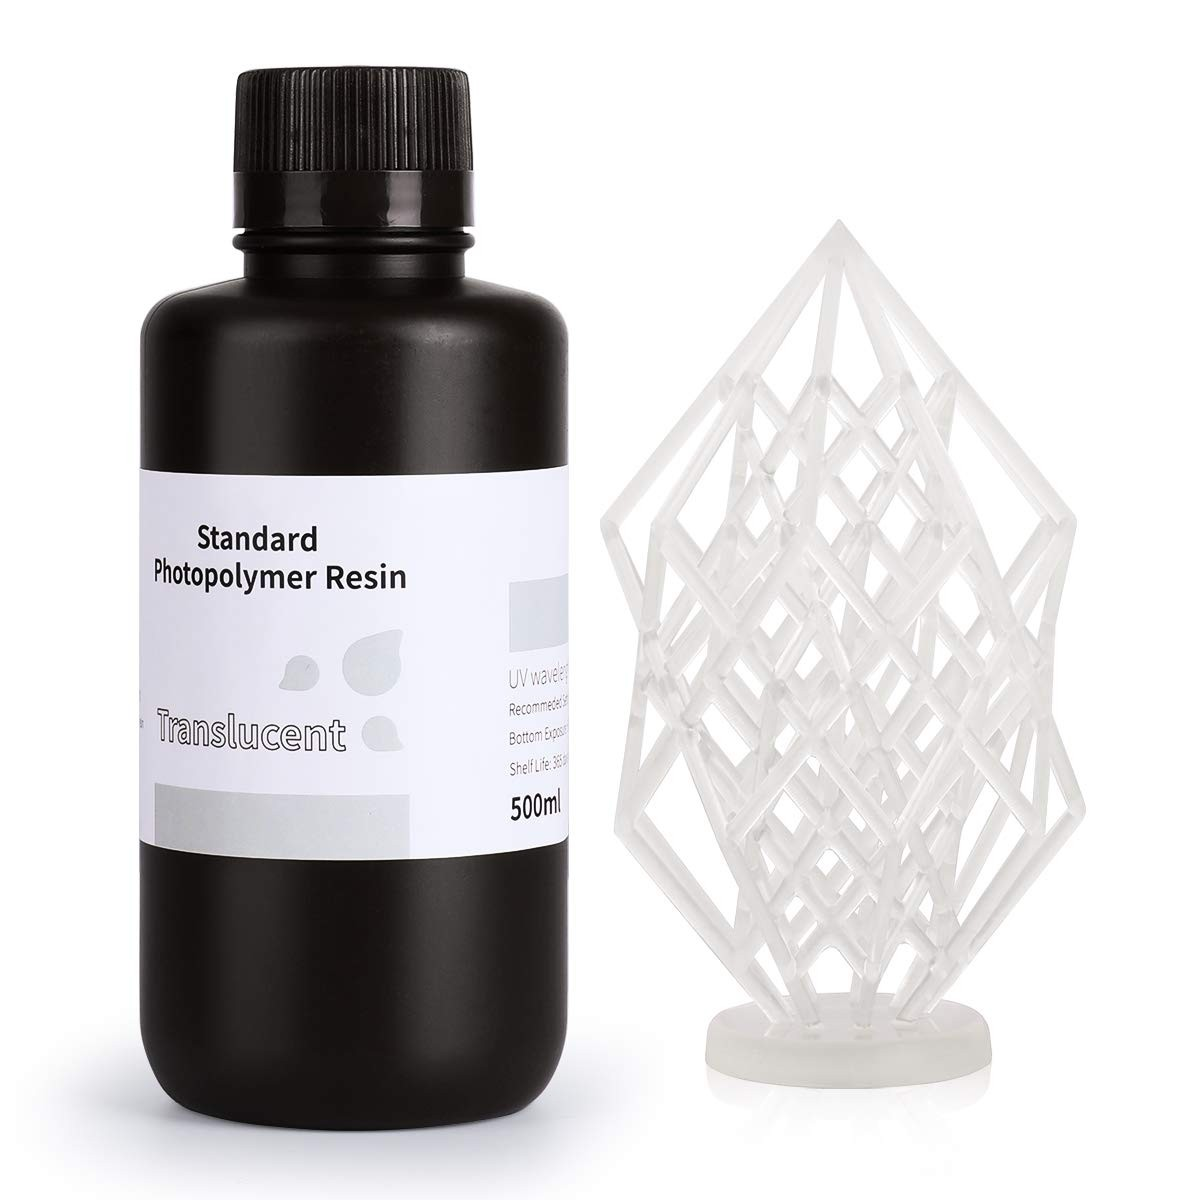 ELEGOO Standard 3D Printer Rapid Resin 500 Gram Translucent